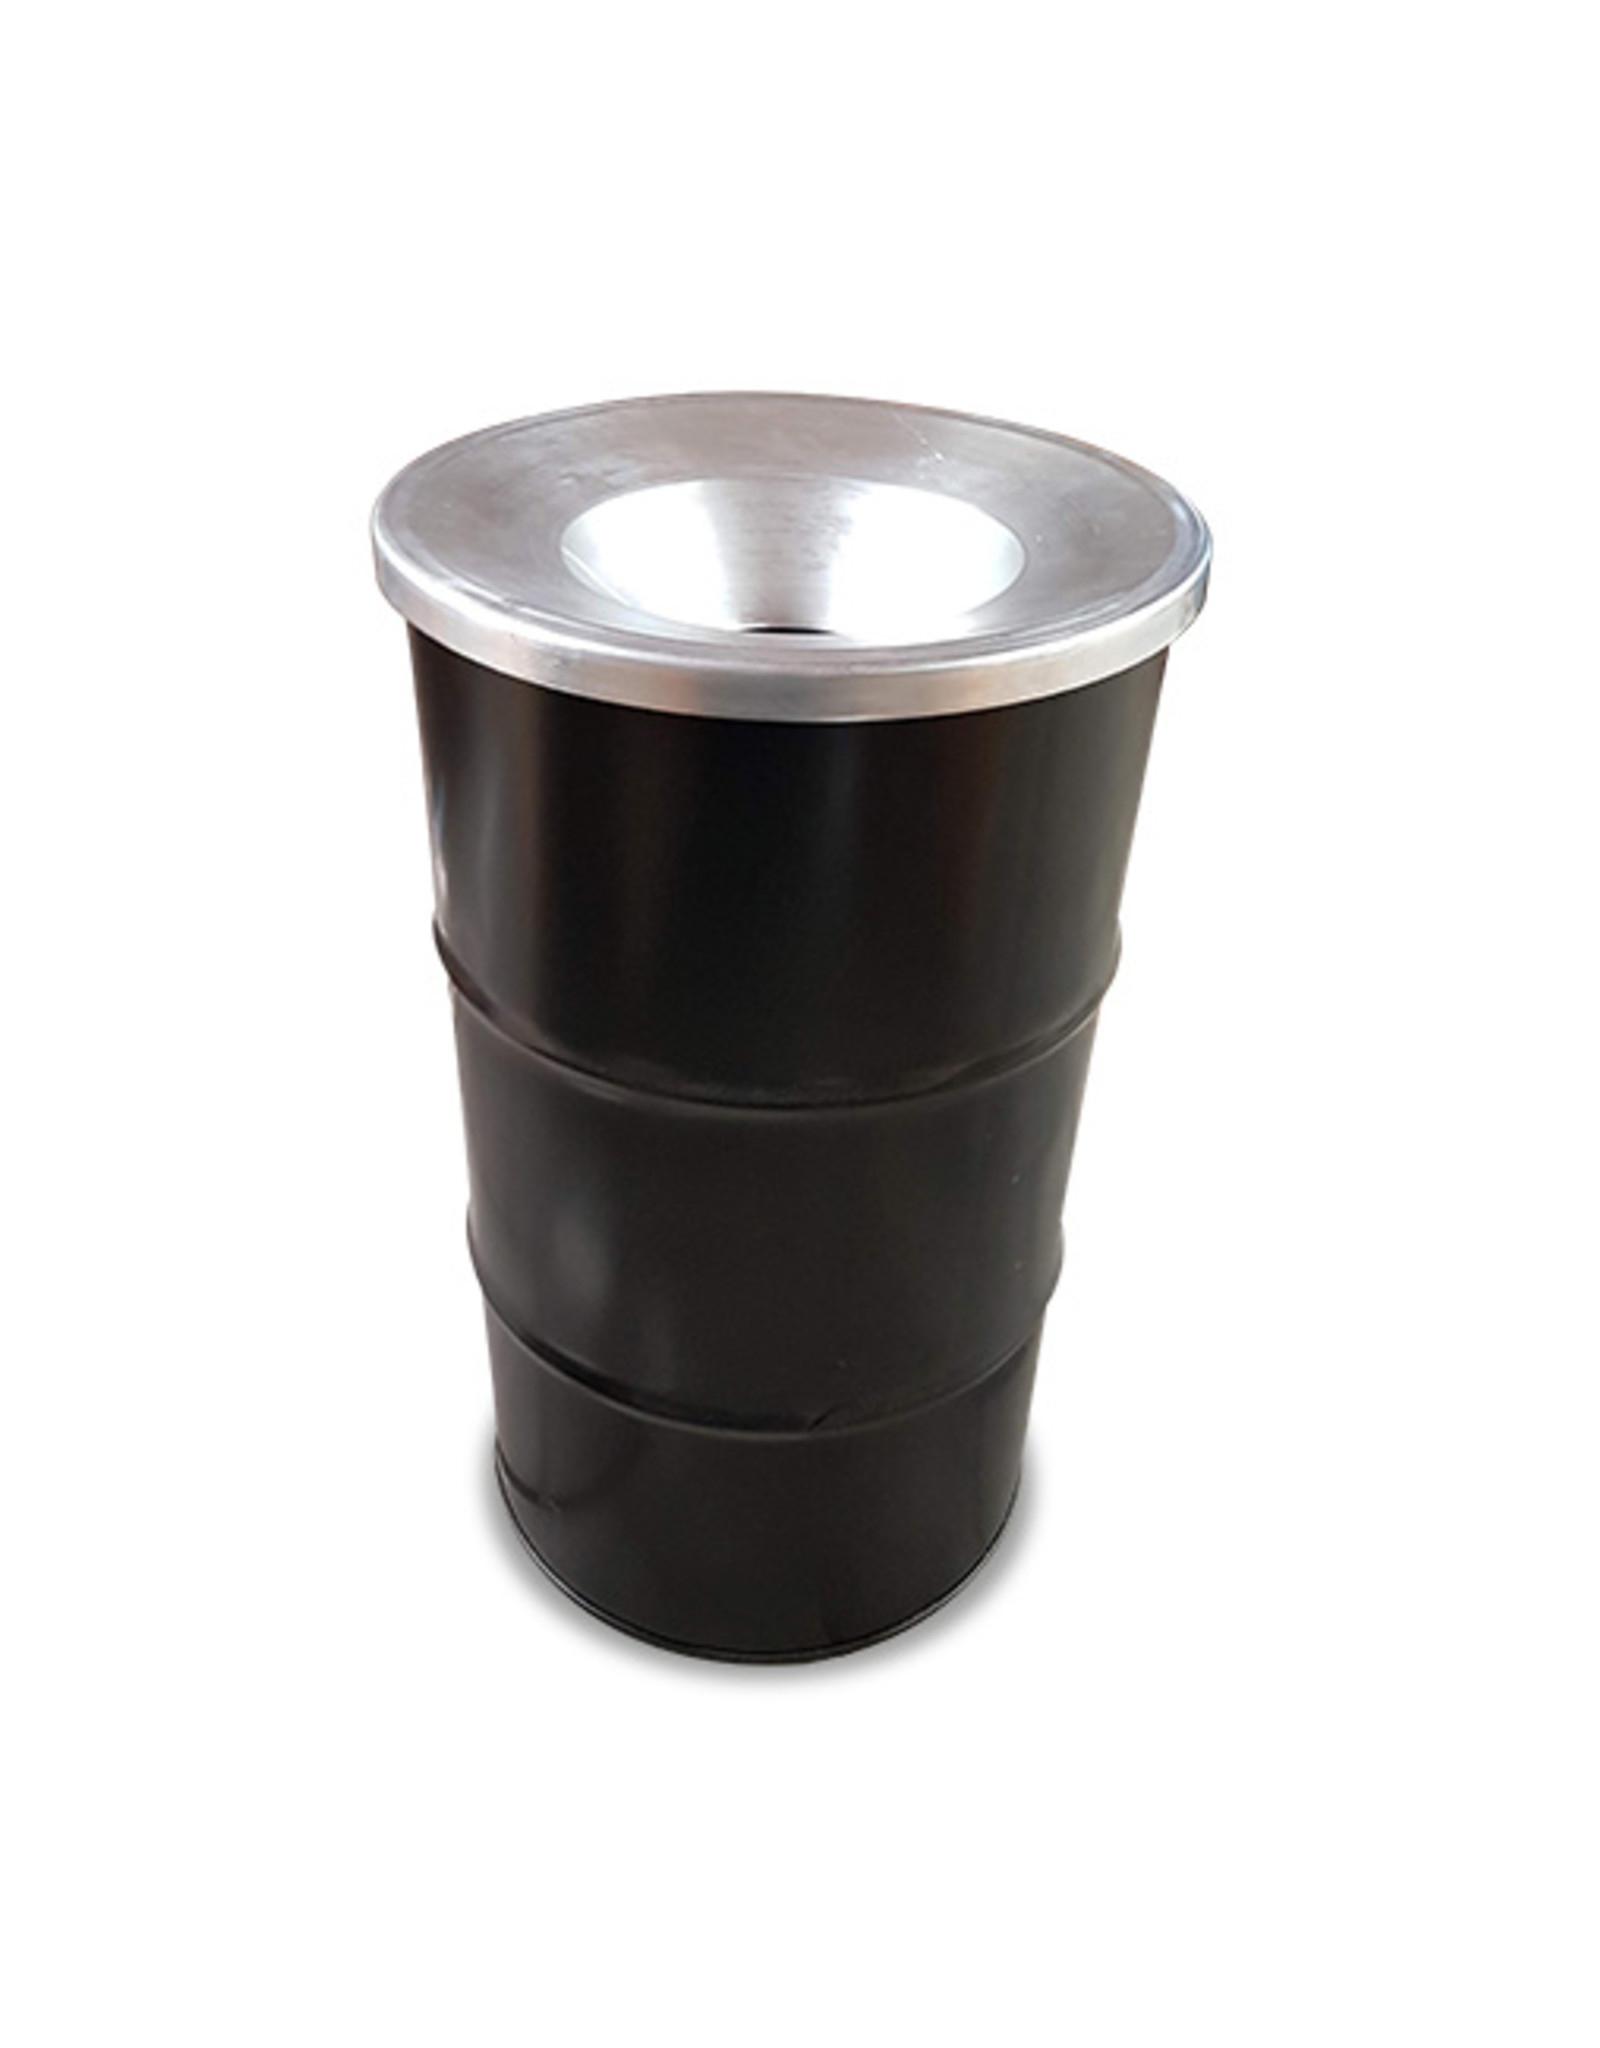 BinBin BinBin vlamwerend deksel met gat voor 120 Liter olievat